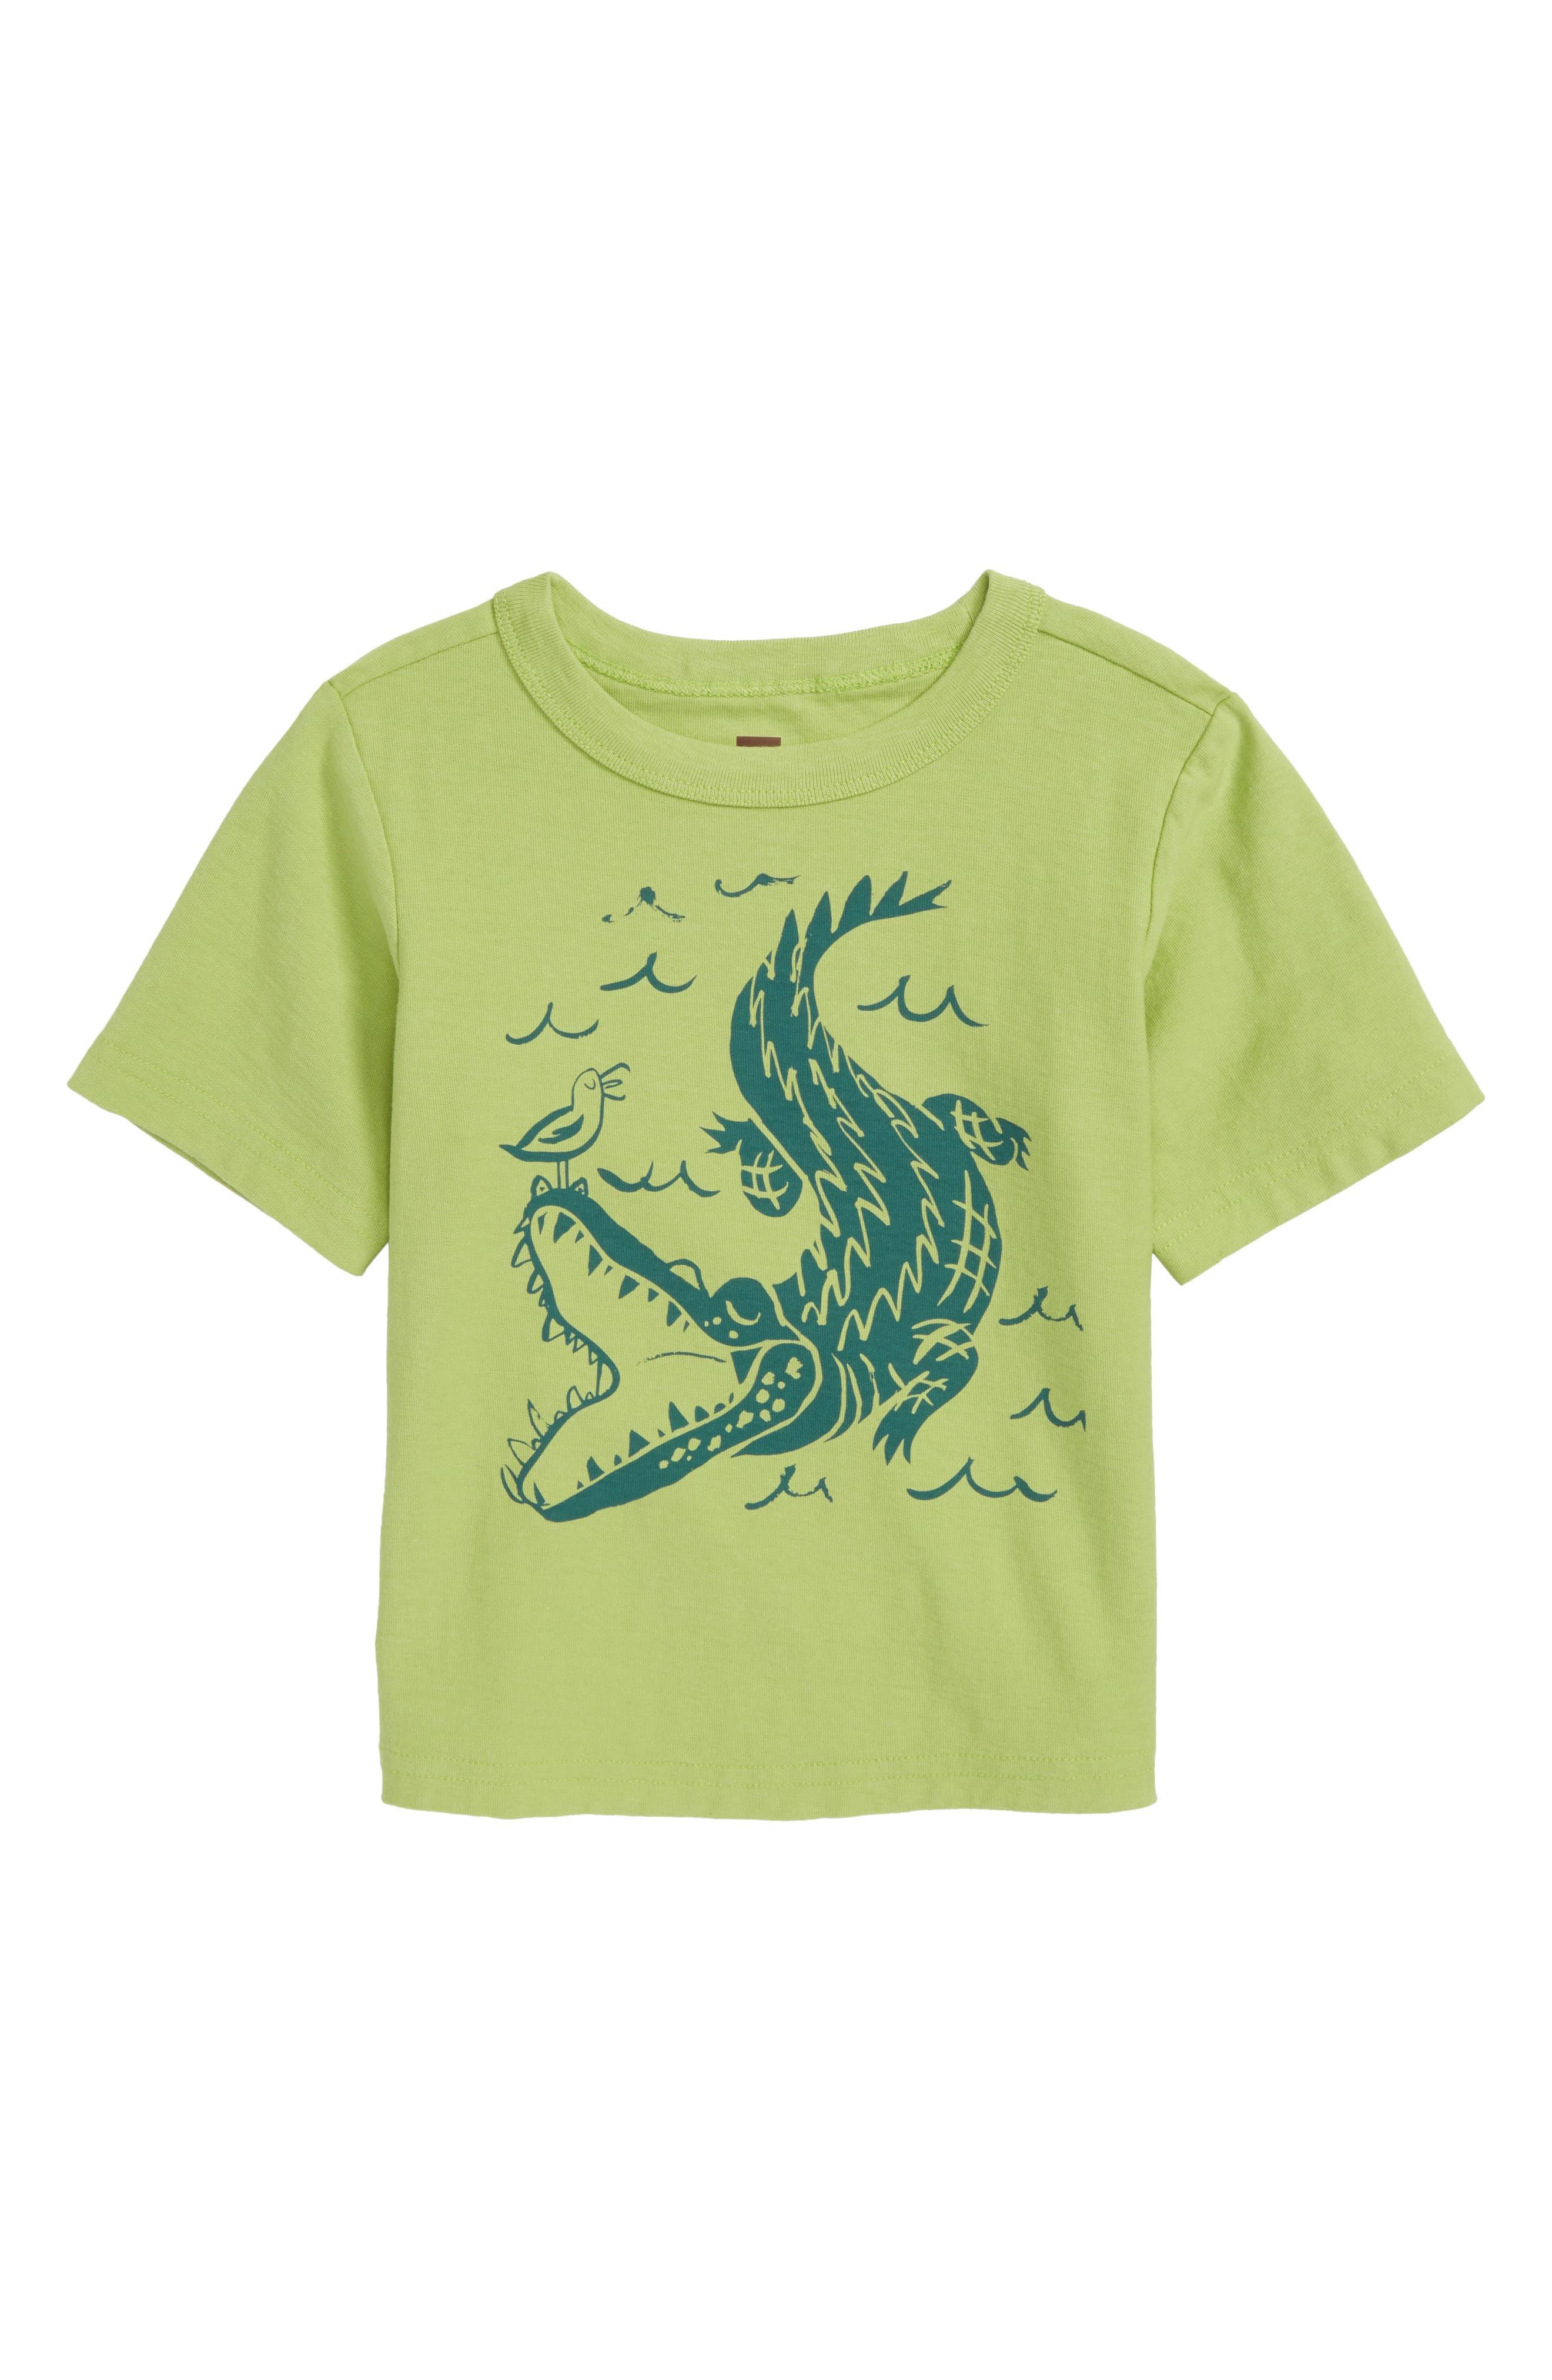 Alligator T-Shirt,                             Main thumbnail 1, color,                             372